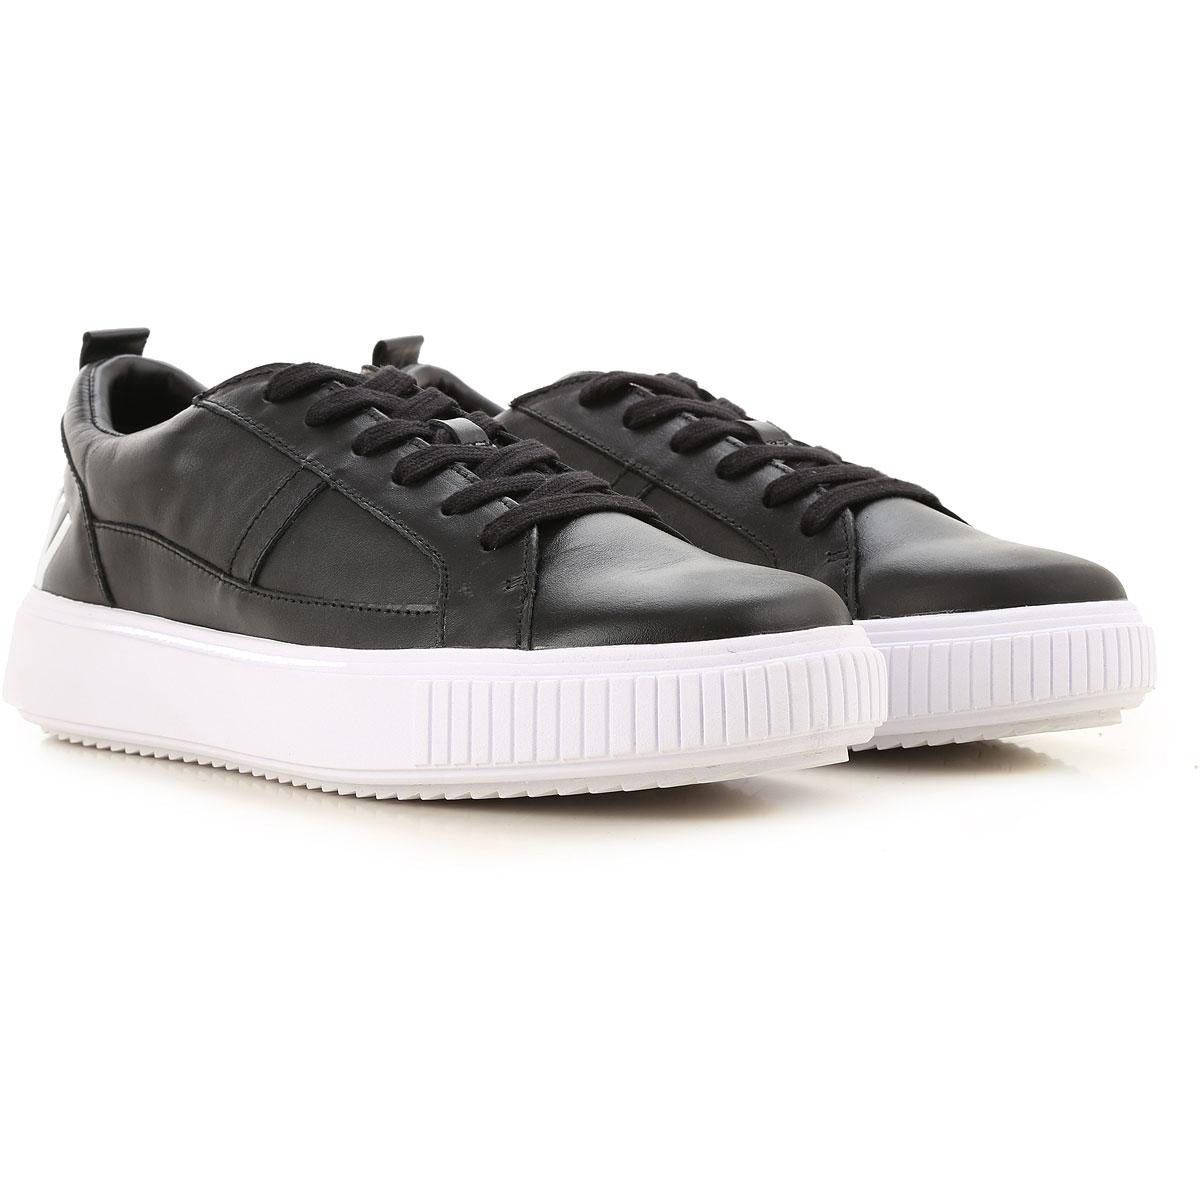 Dirk Bikkembergs Sneaker Homme Pas cher en Soldes, Noir, Cuir, 2019, 40 41 42 43 44